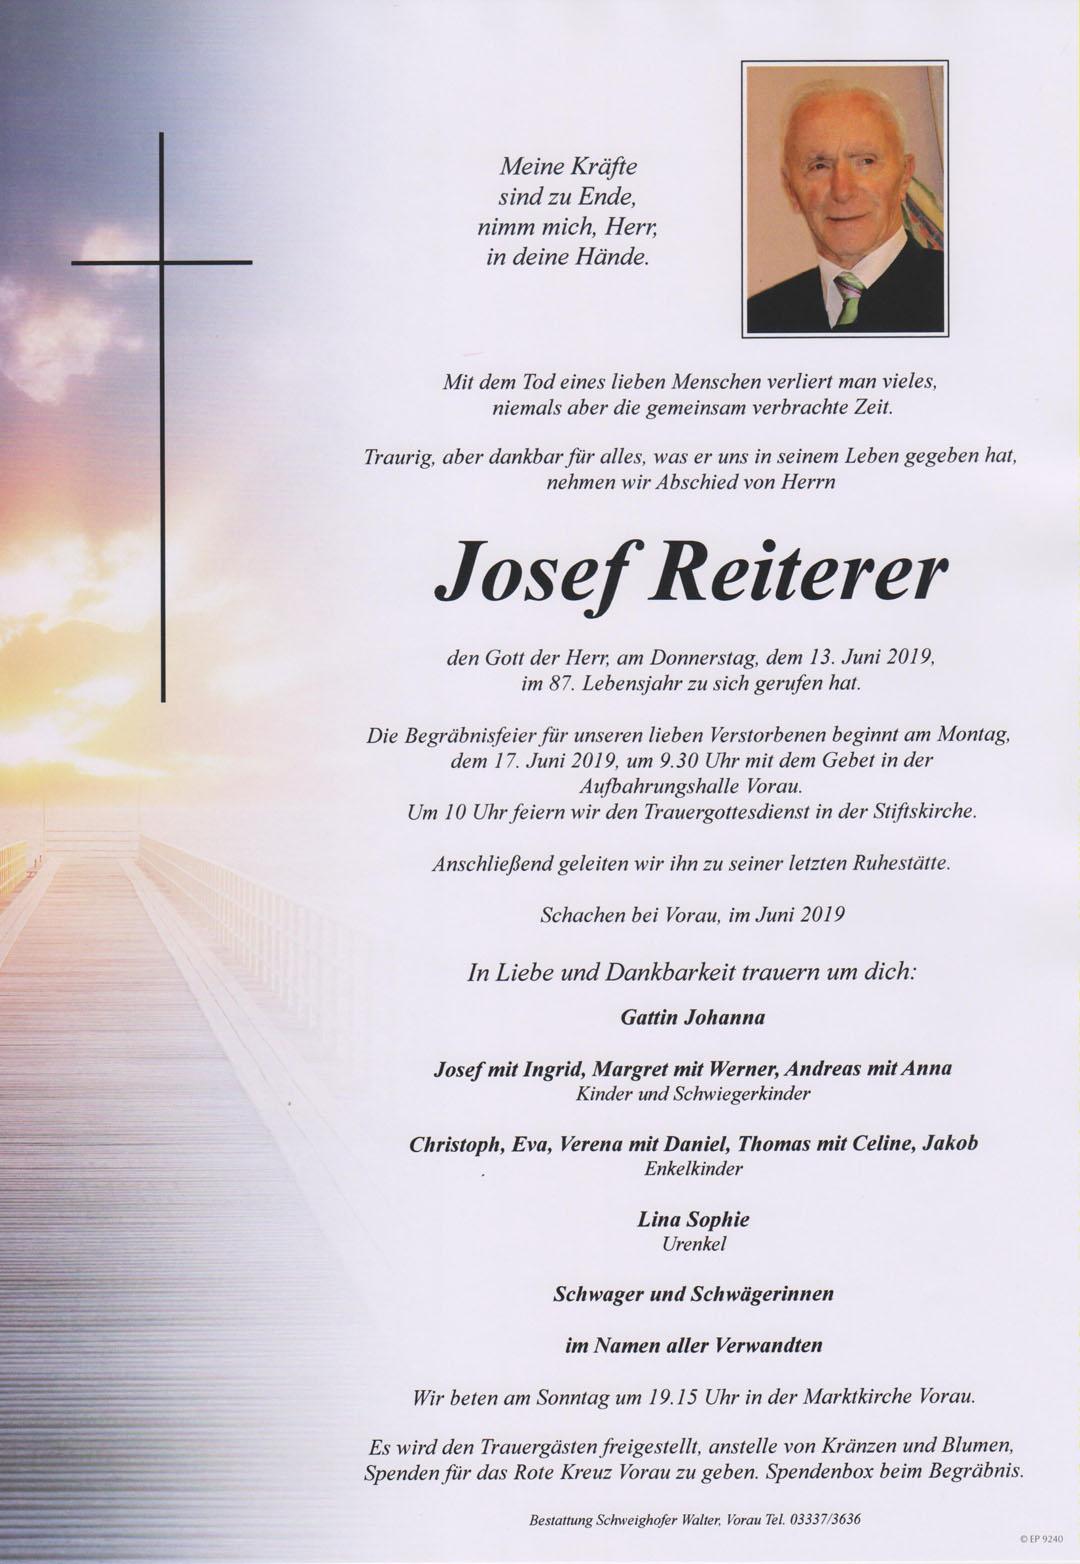 Josef Reiterer